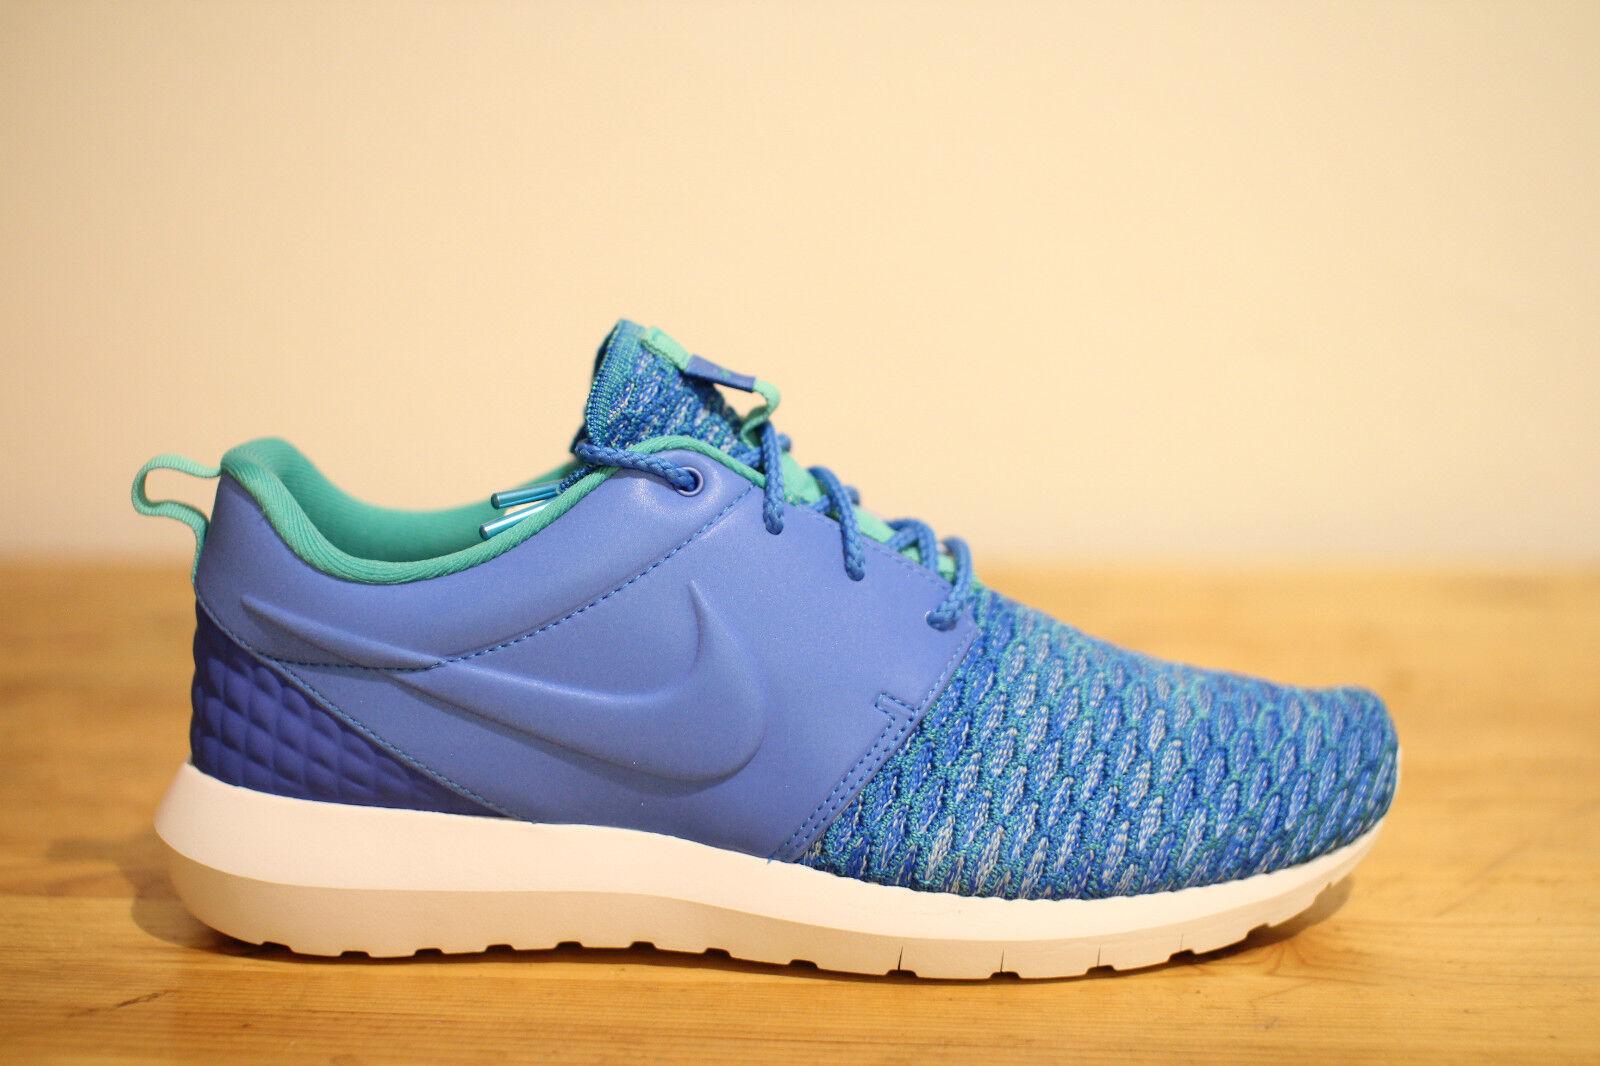 Nike Roshe run Flyknit Blau Gr. 42,43,44,45 NEU & OVP